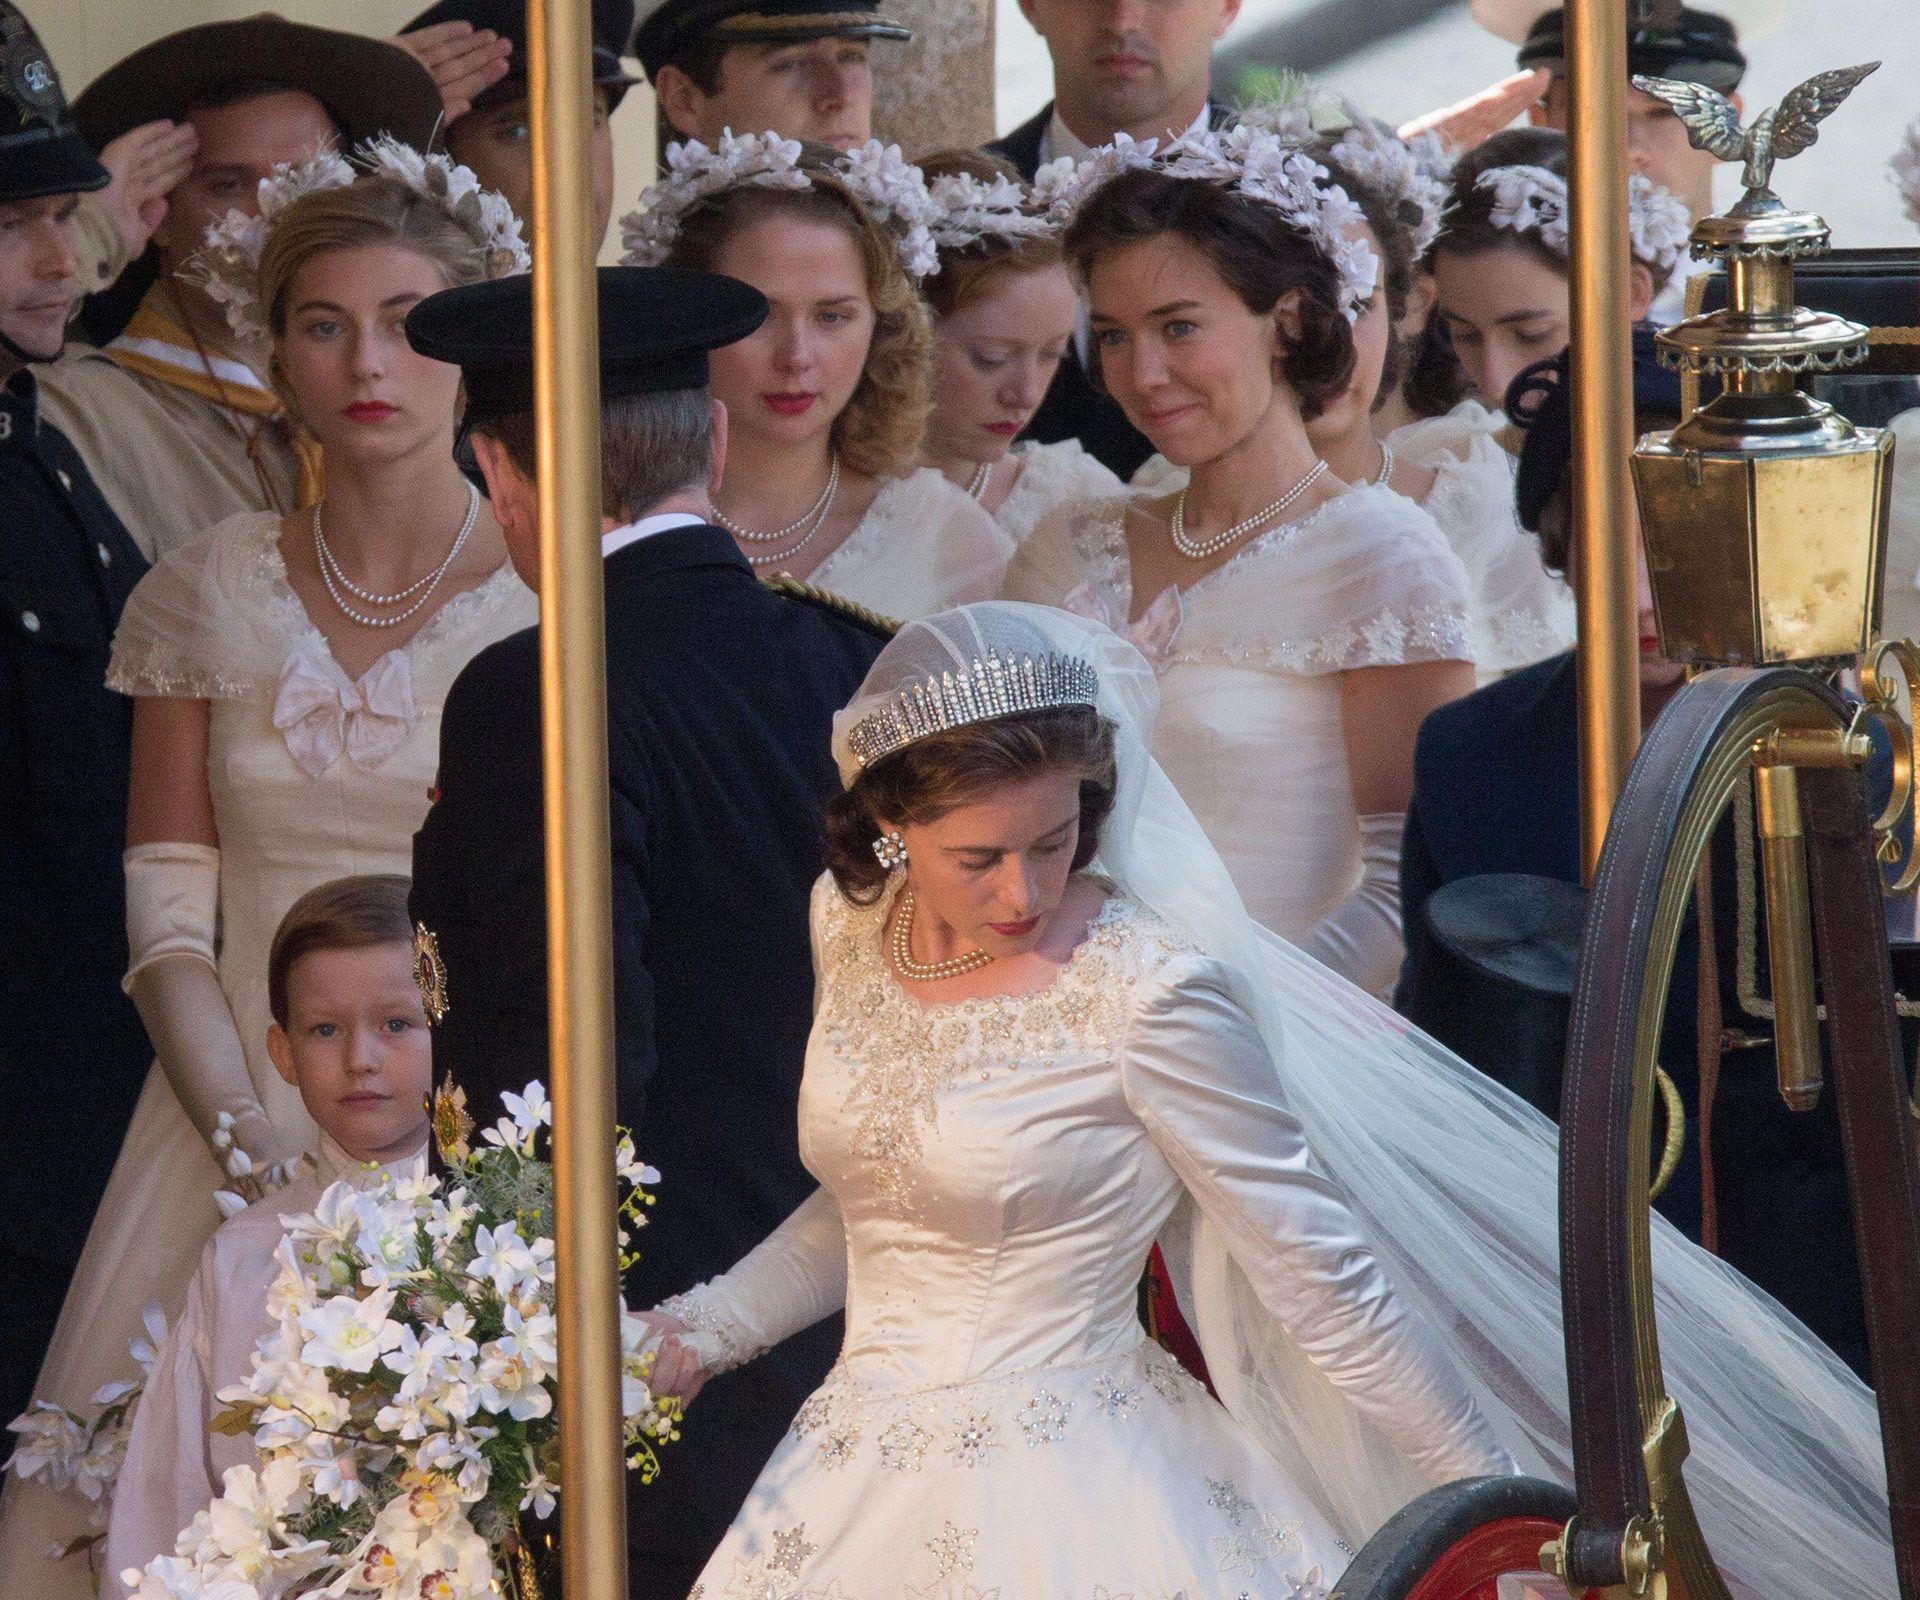 Queen Wedding: Queen Elizabeth's Breathtaking 1947 Wedding To Prince